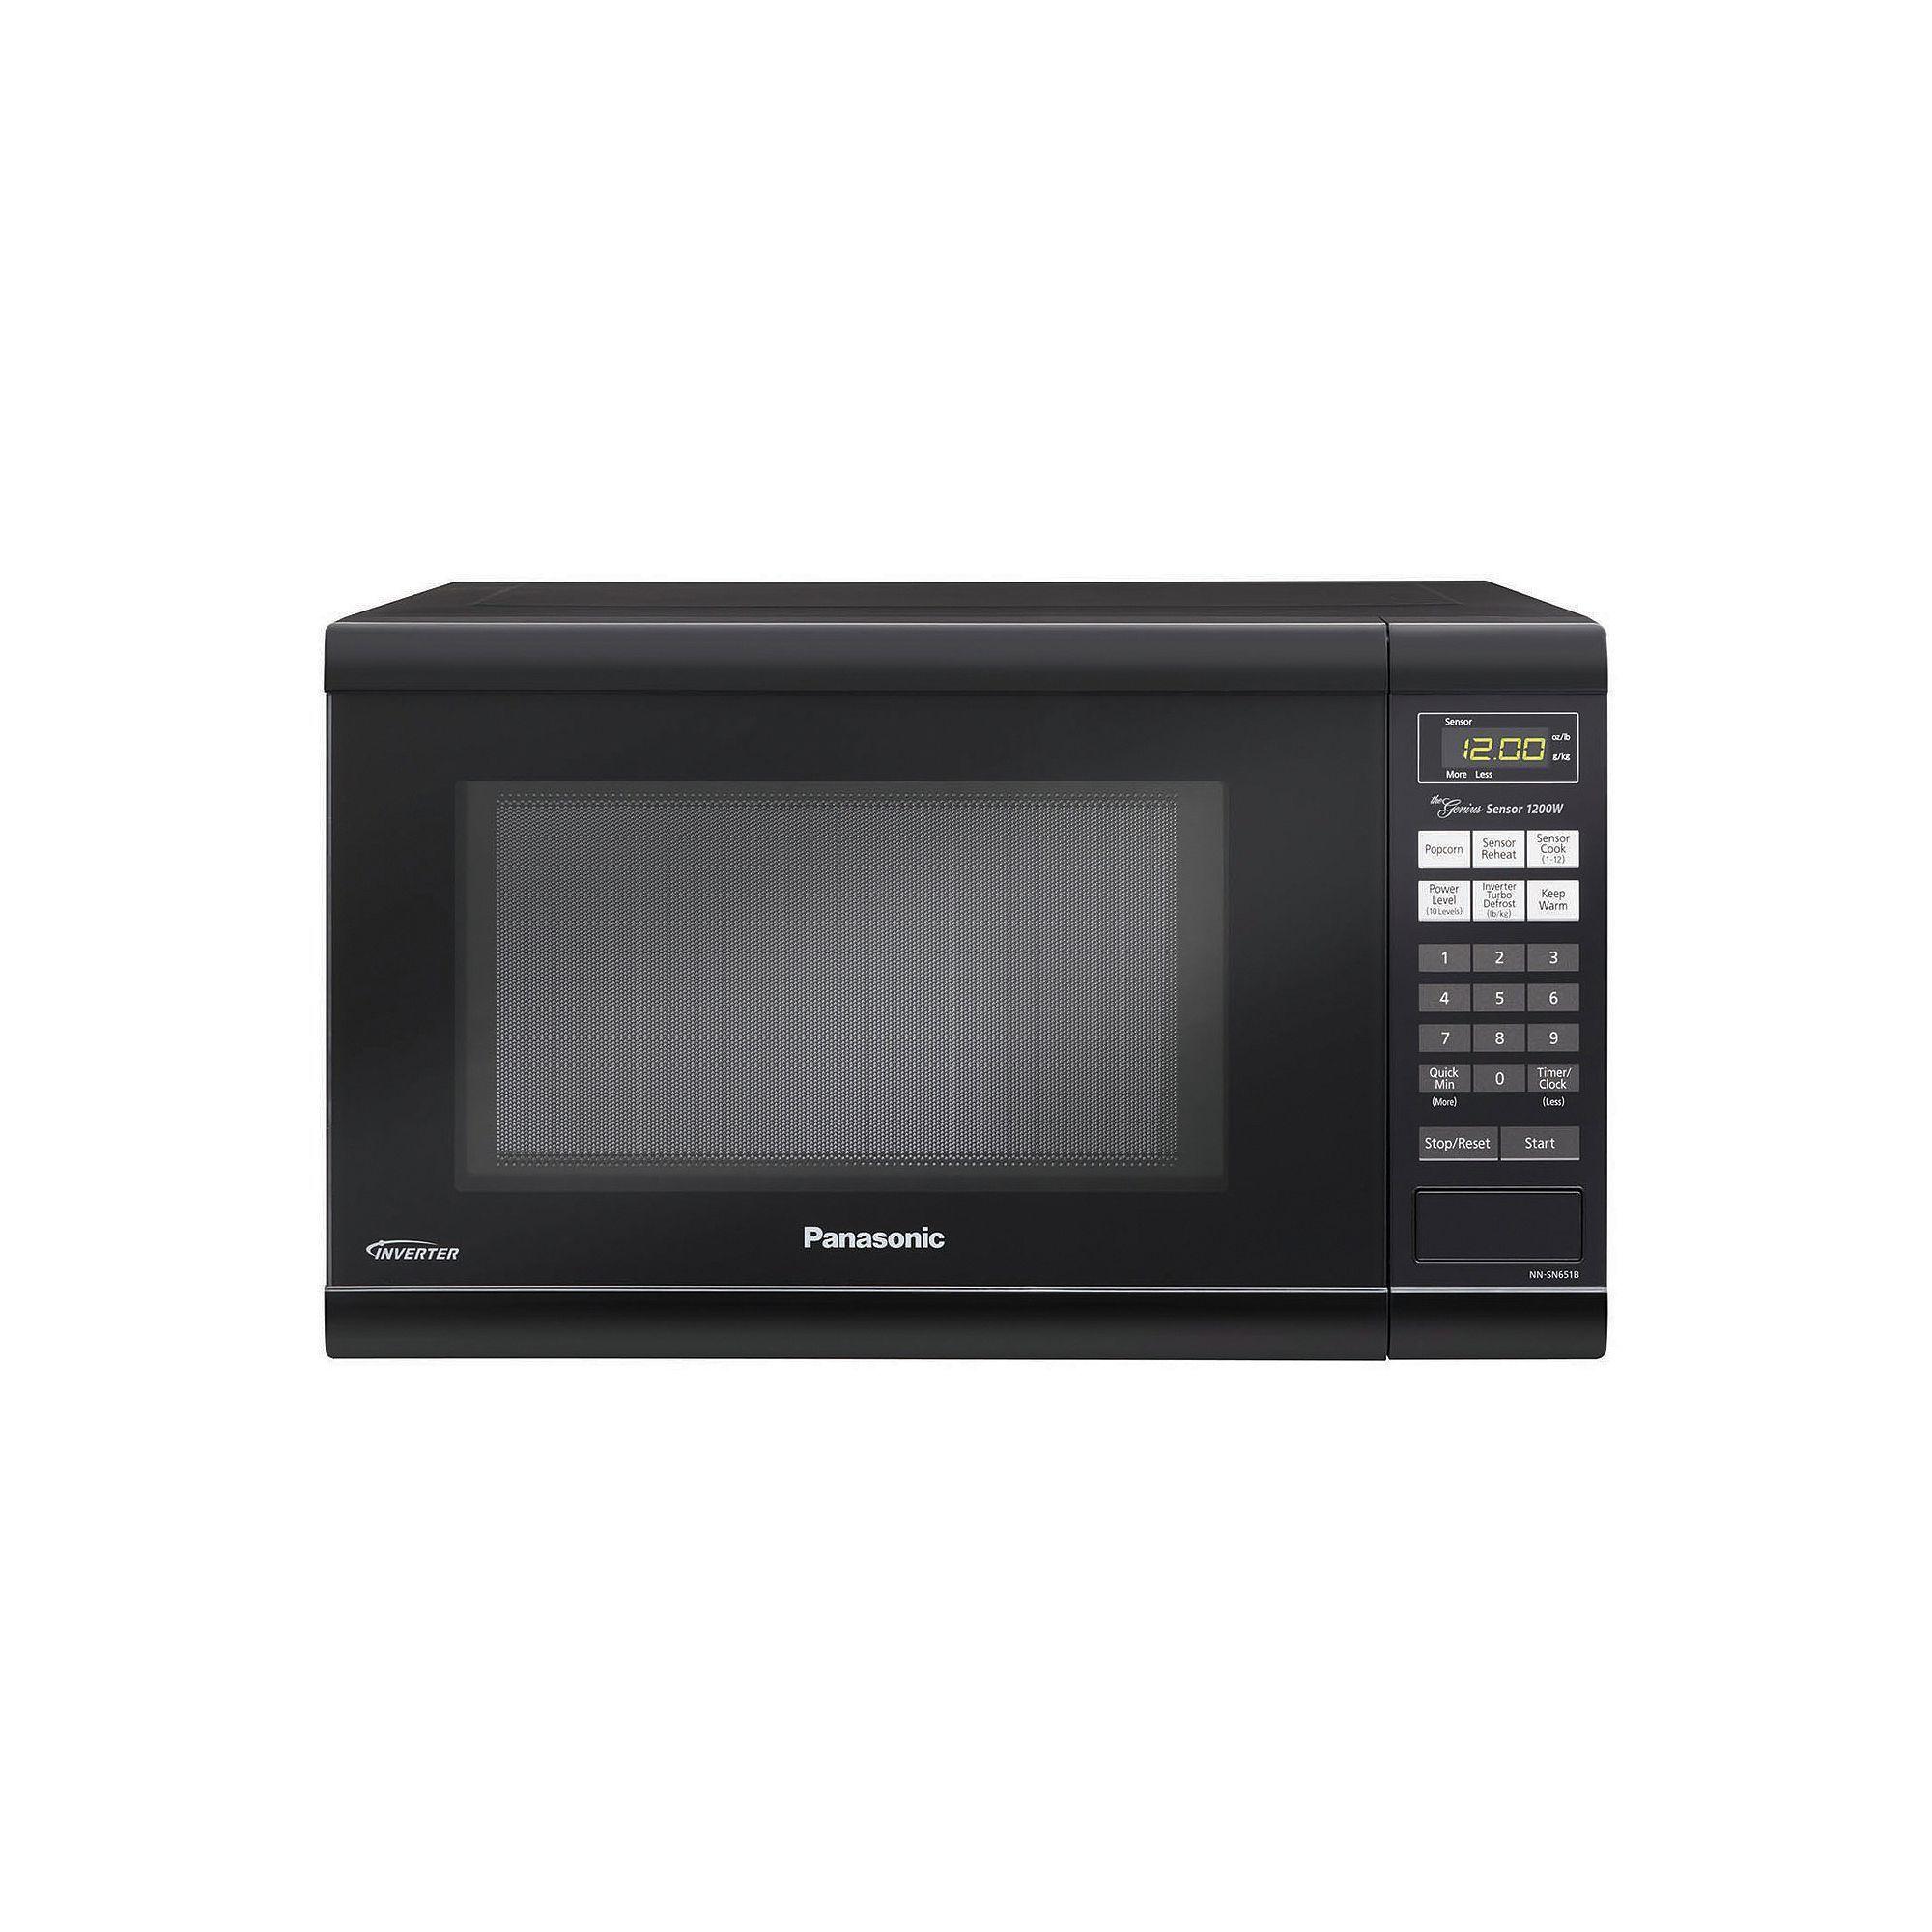 Panasonic 1200 Watt Microwave Oven Microwave Oven Microwave Oven Sale